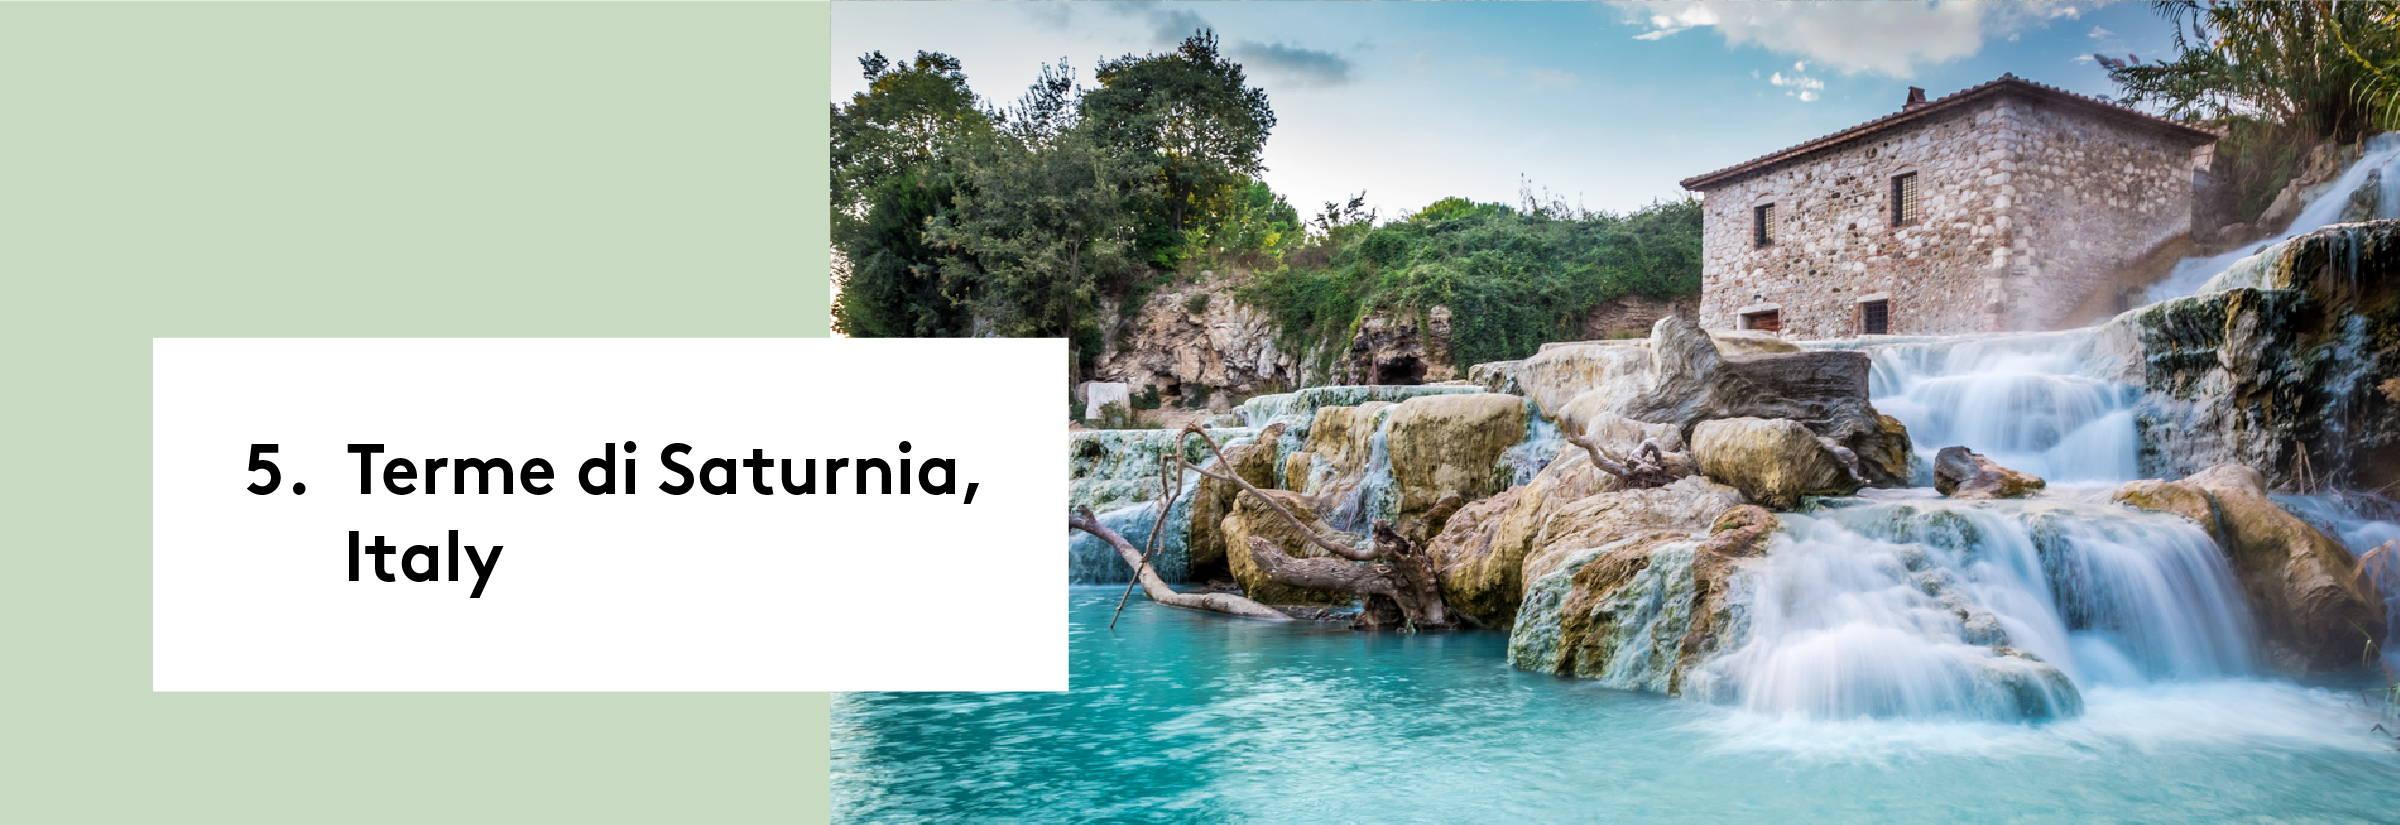 5. Terme di Saturnia, Italy